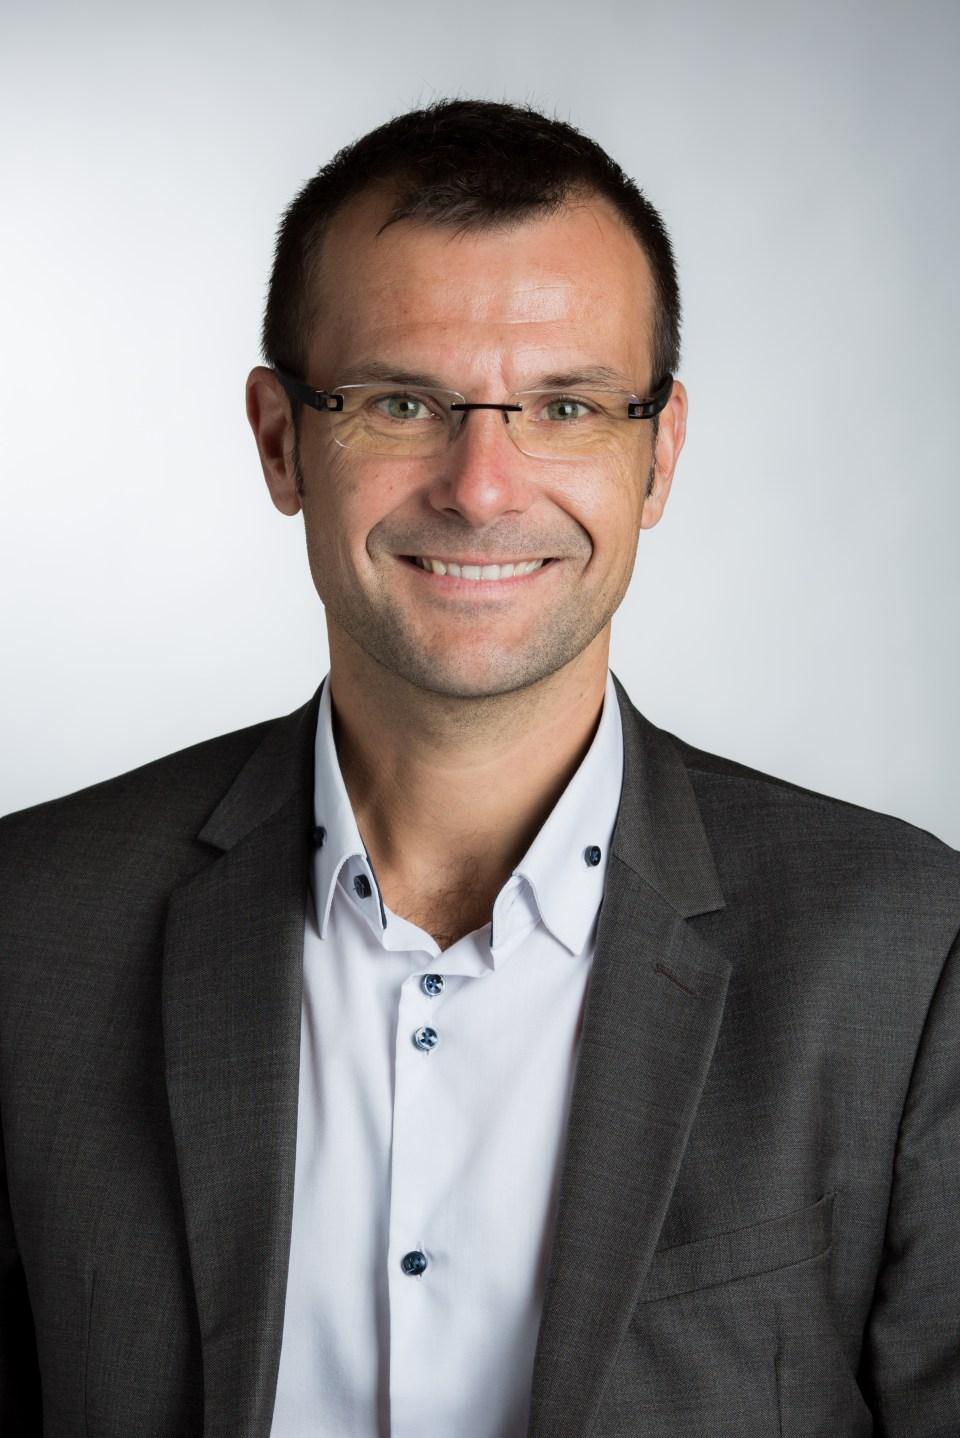 Benoit Heib